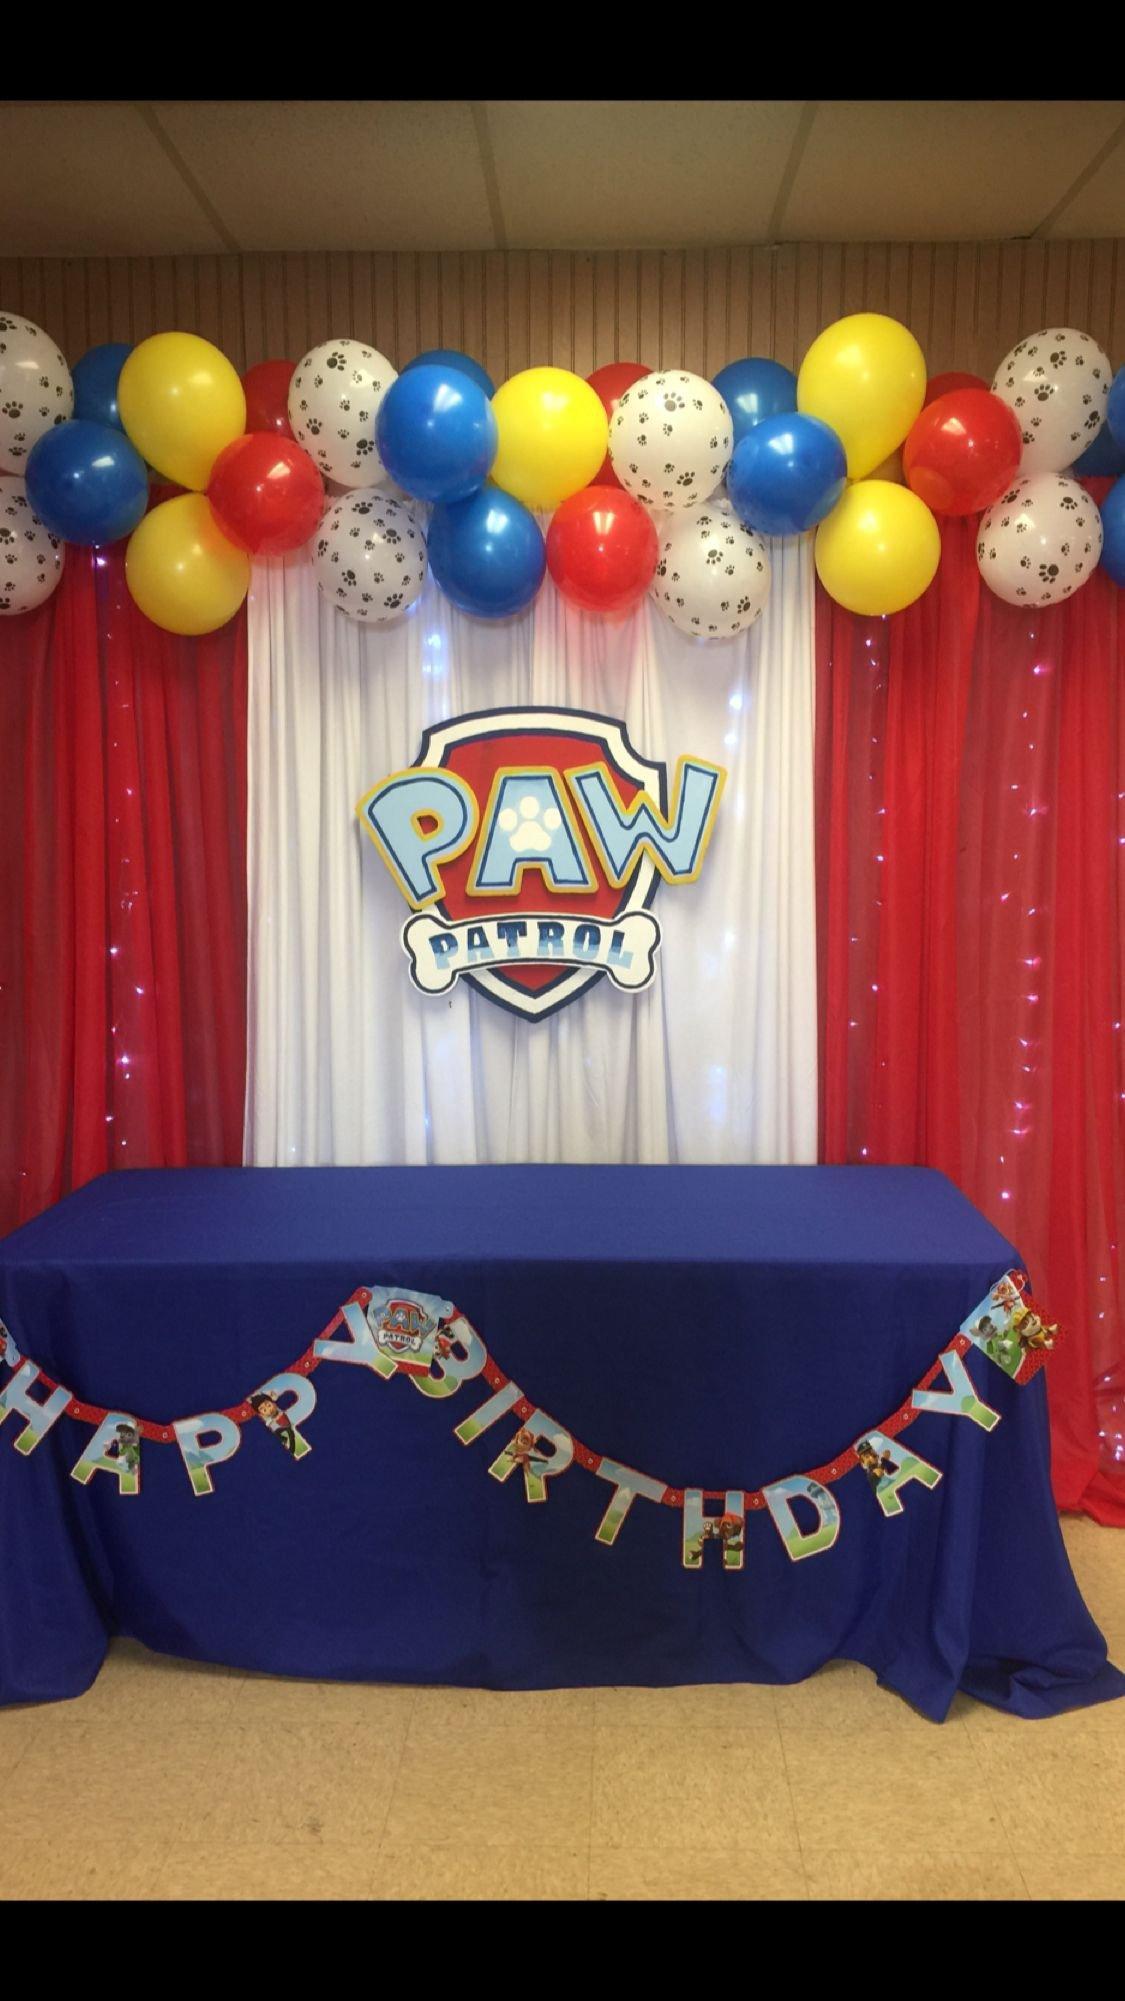 Paw Patrol Bedroom Decor Inspirational Paw Patrol Decorations